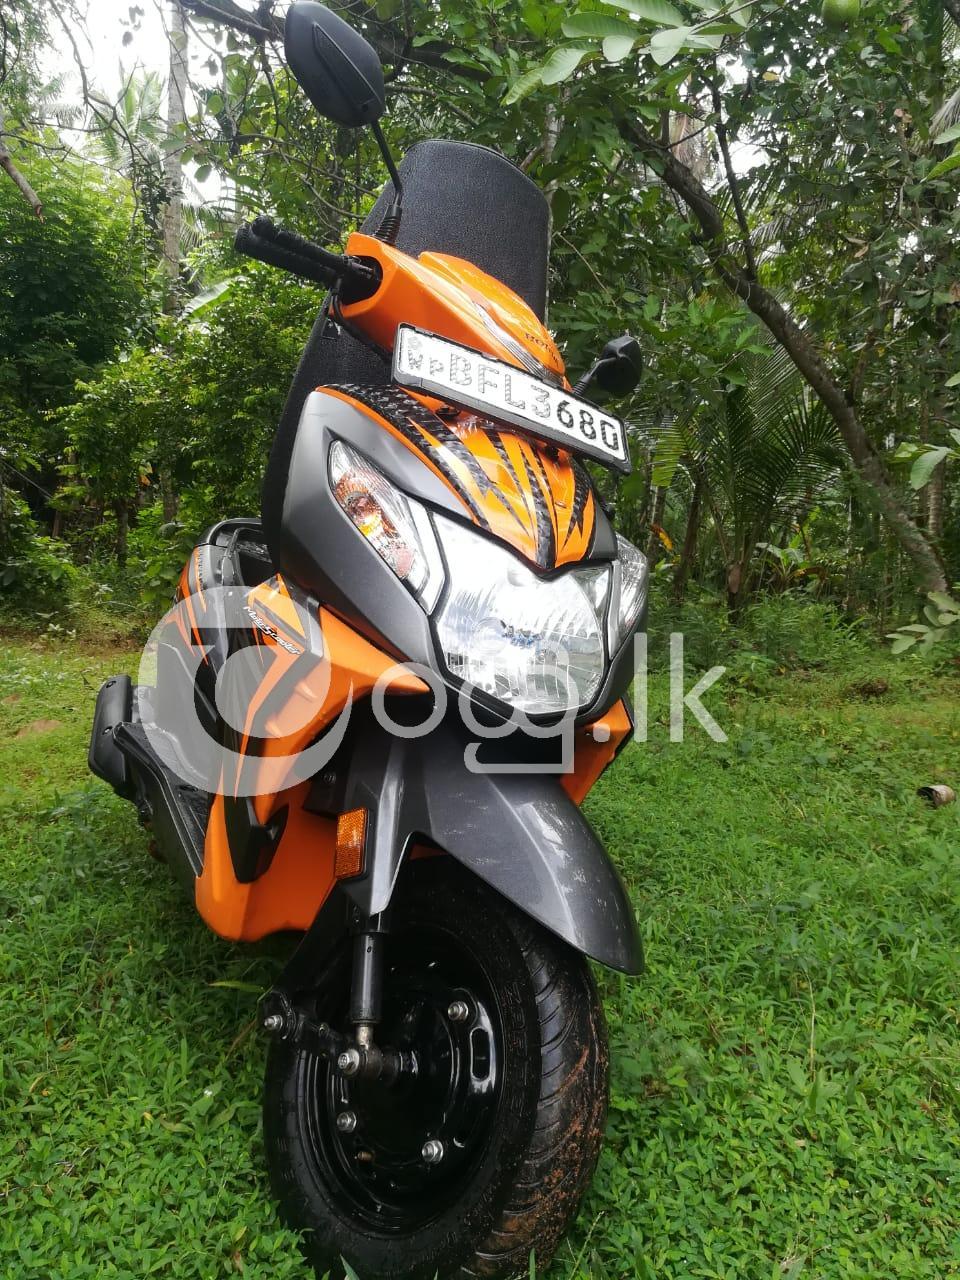 Honda Dio 2017 Motorbikes & Scooters in Delgoda